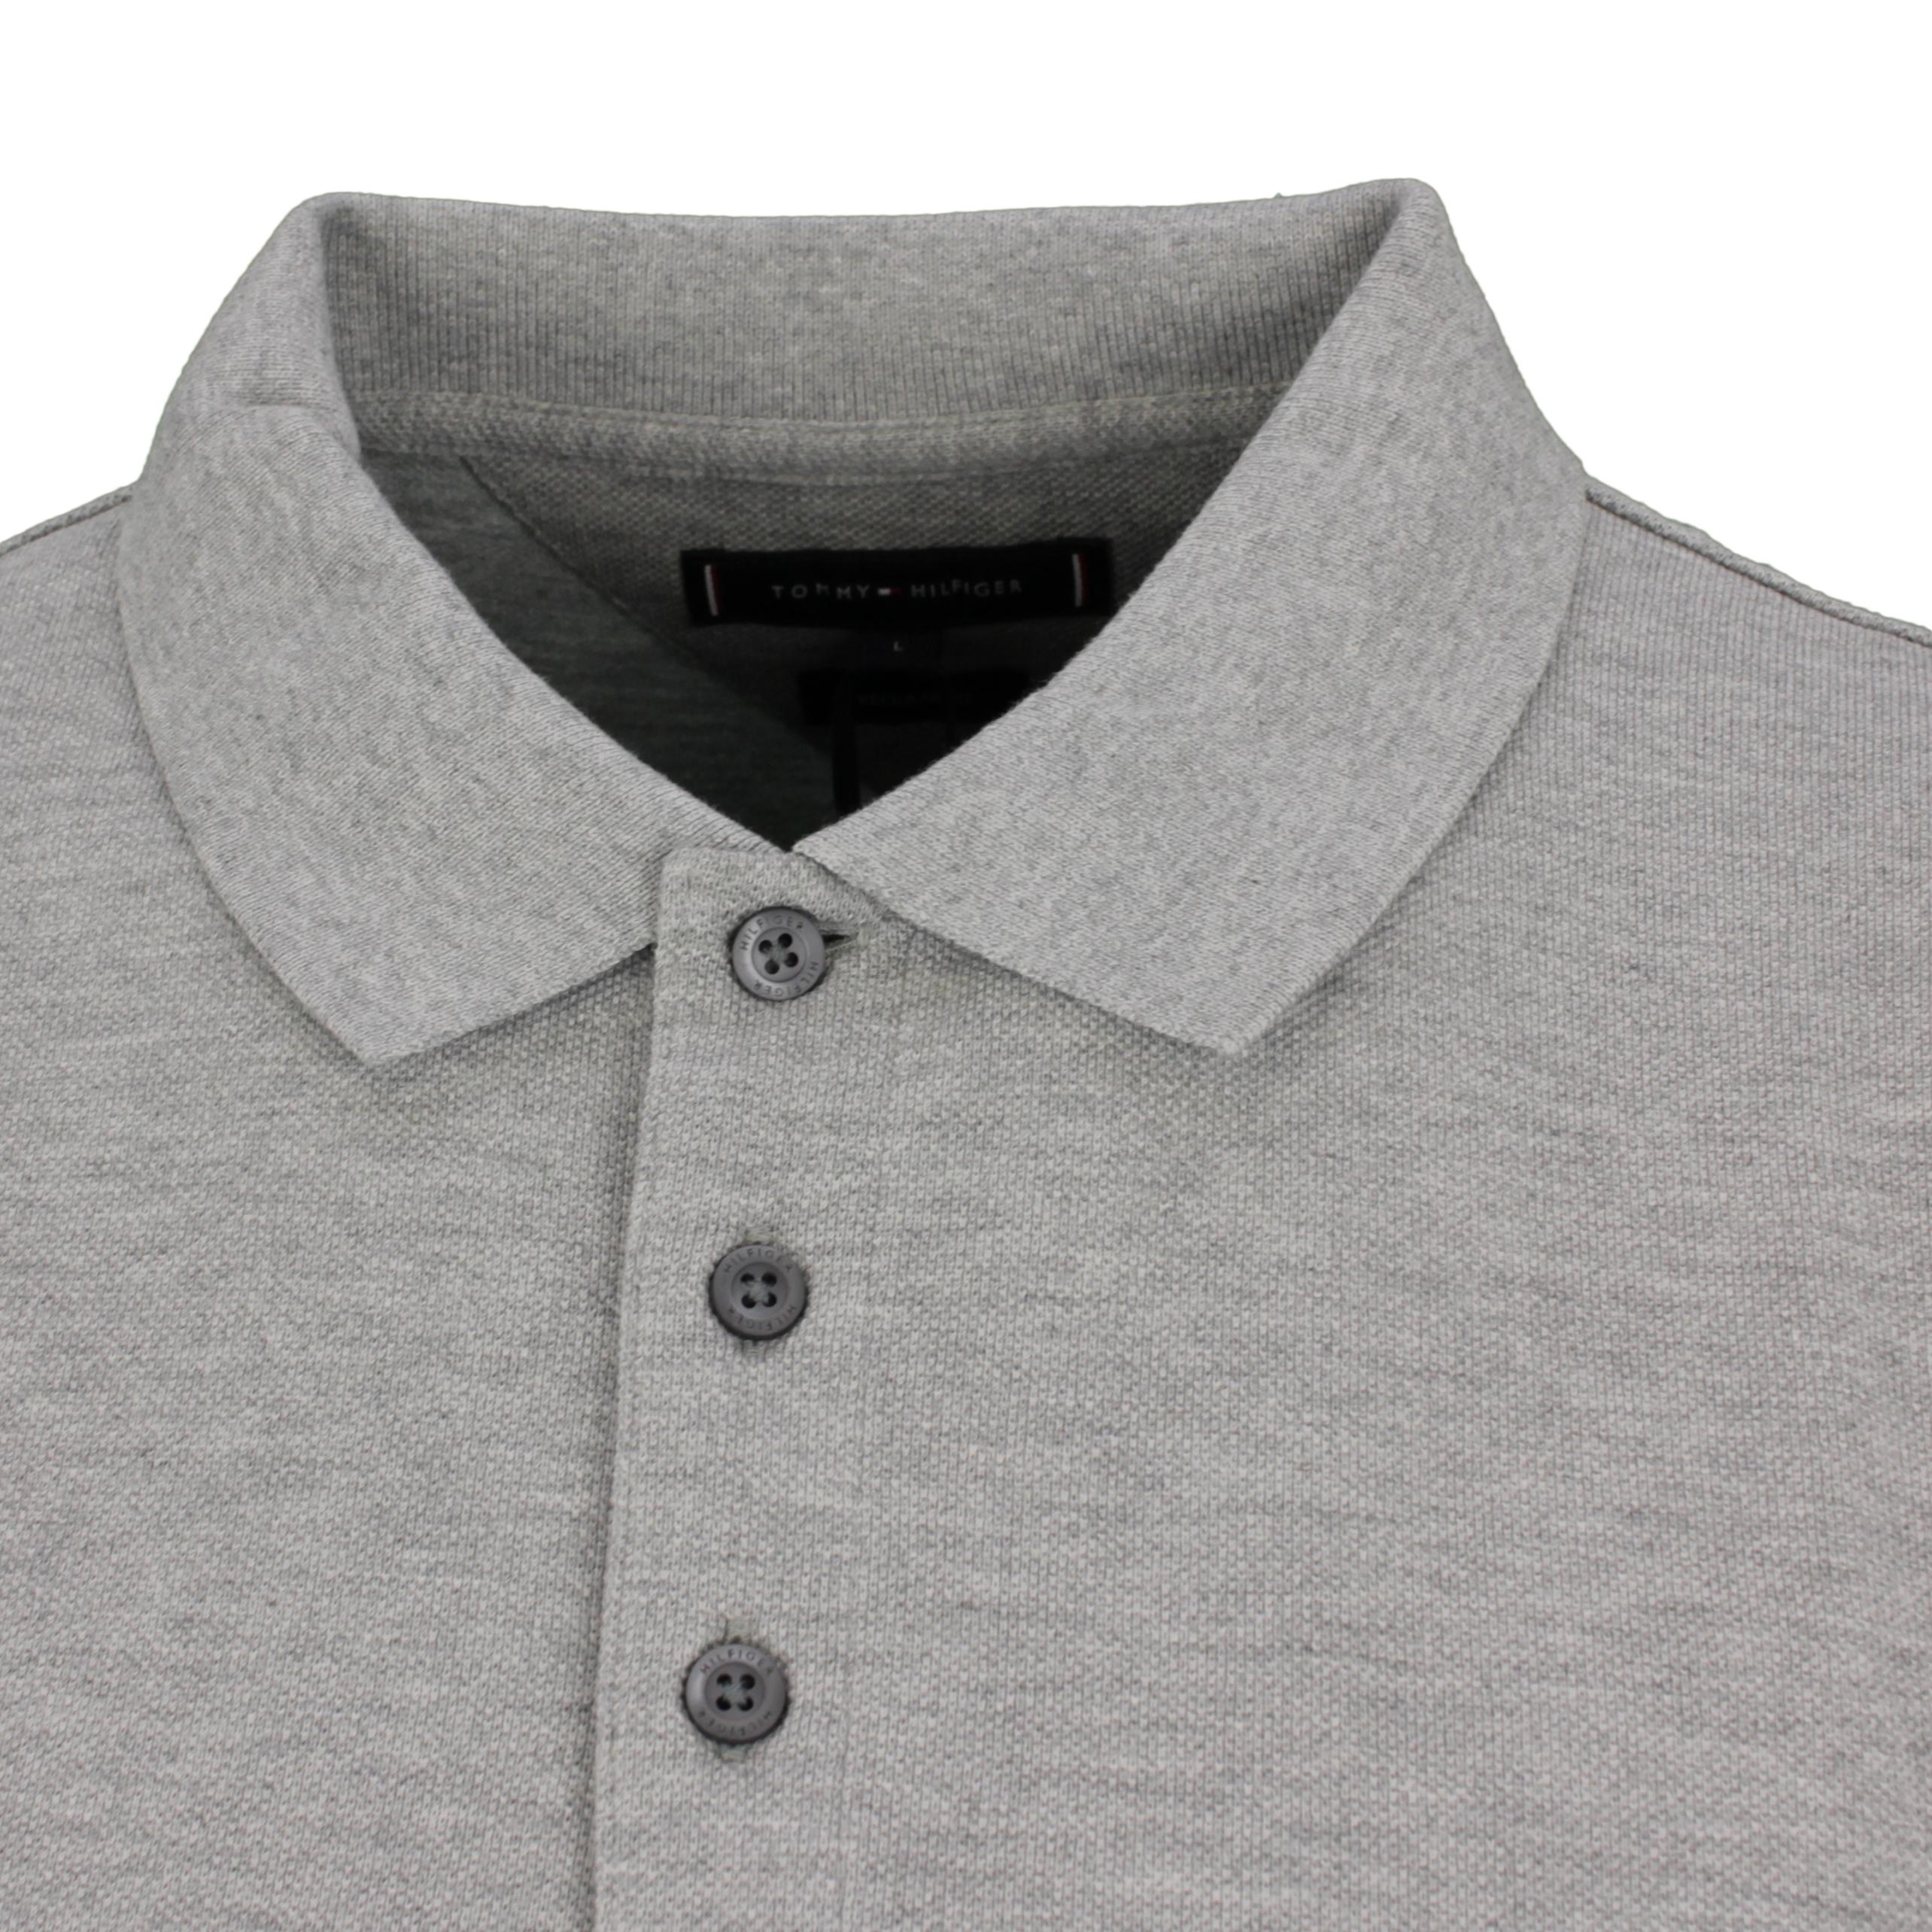 Tommy Hilfiger Polo Shirt Contrast Placket grau MW0MW19379 P91 grey